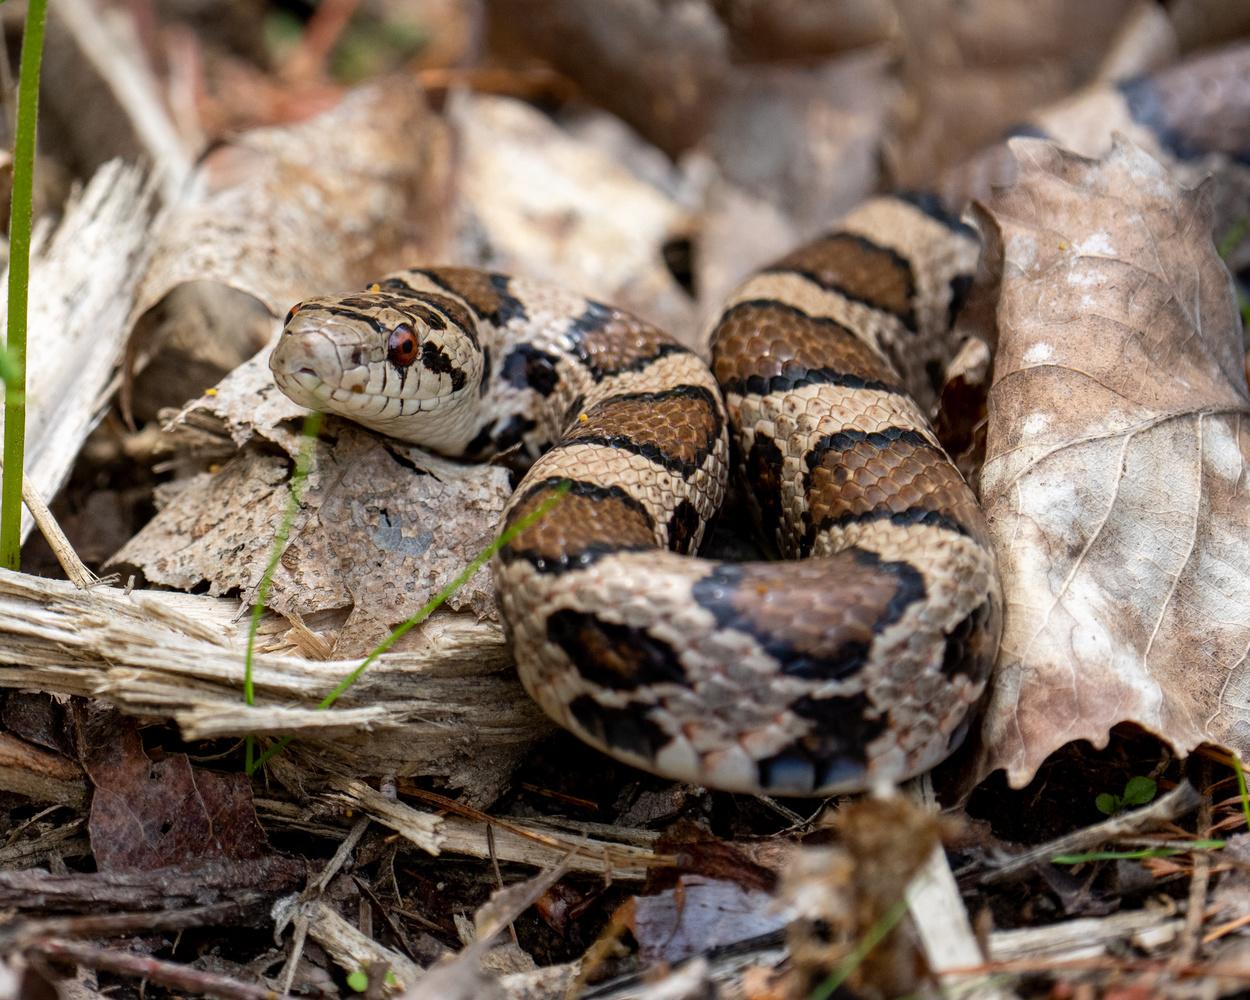 Snake I found in my garden by Skyler Ewing